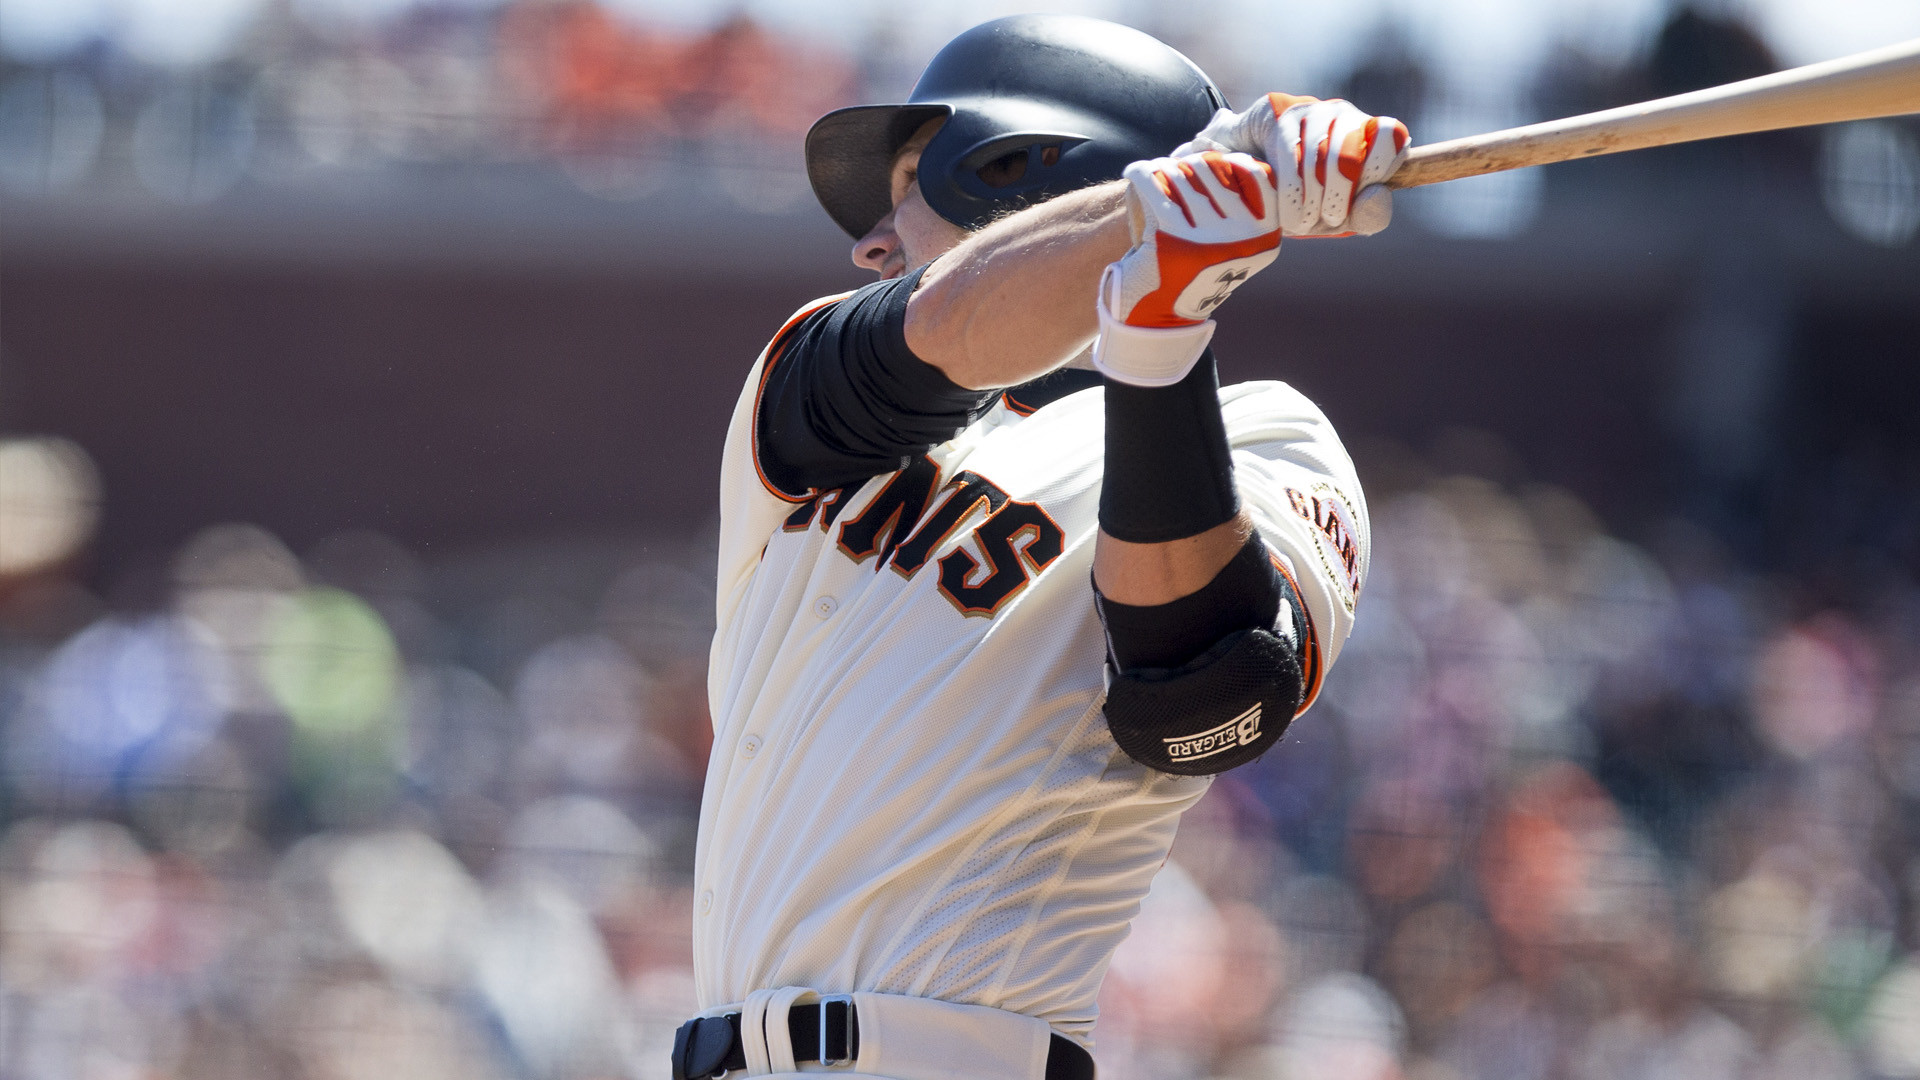 Giants lineup: Posey returns to catch Samardzija, bat clean up | NBCS Bay  Area